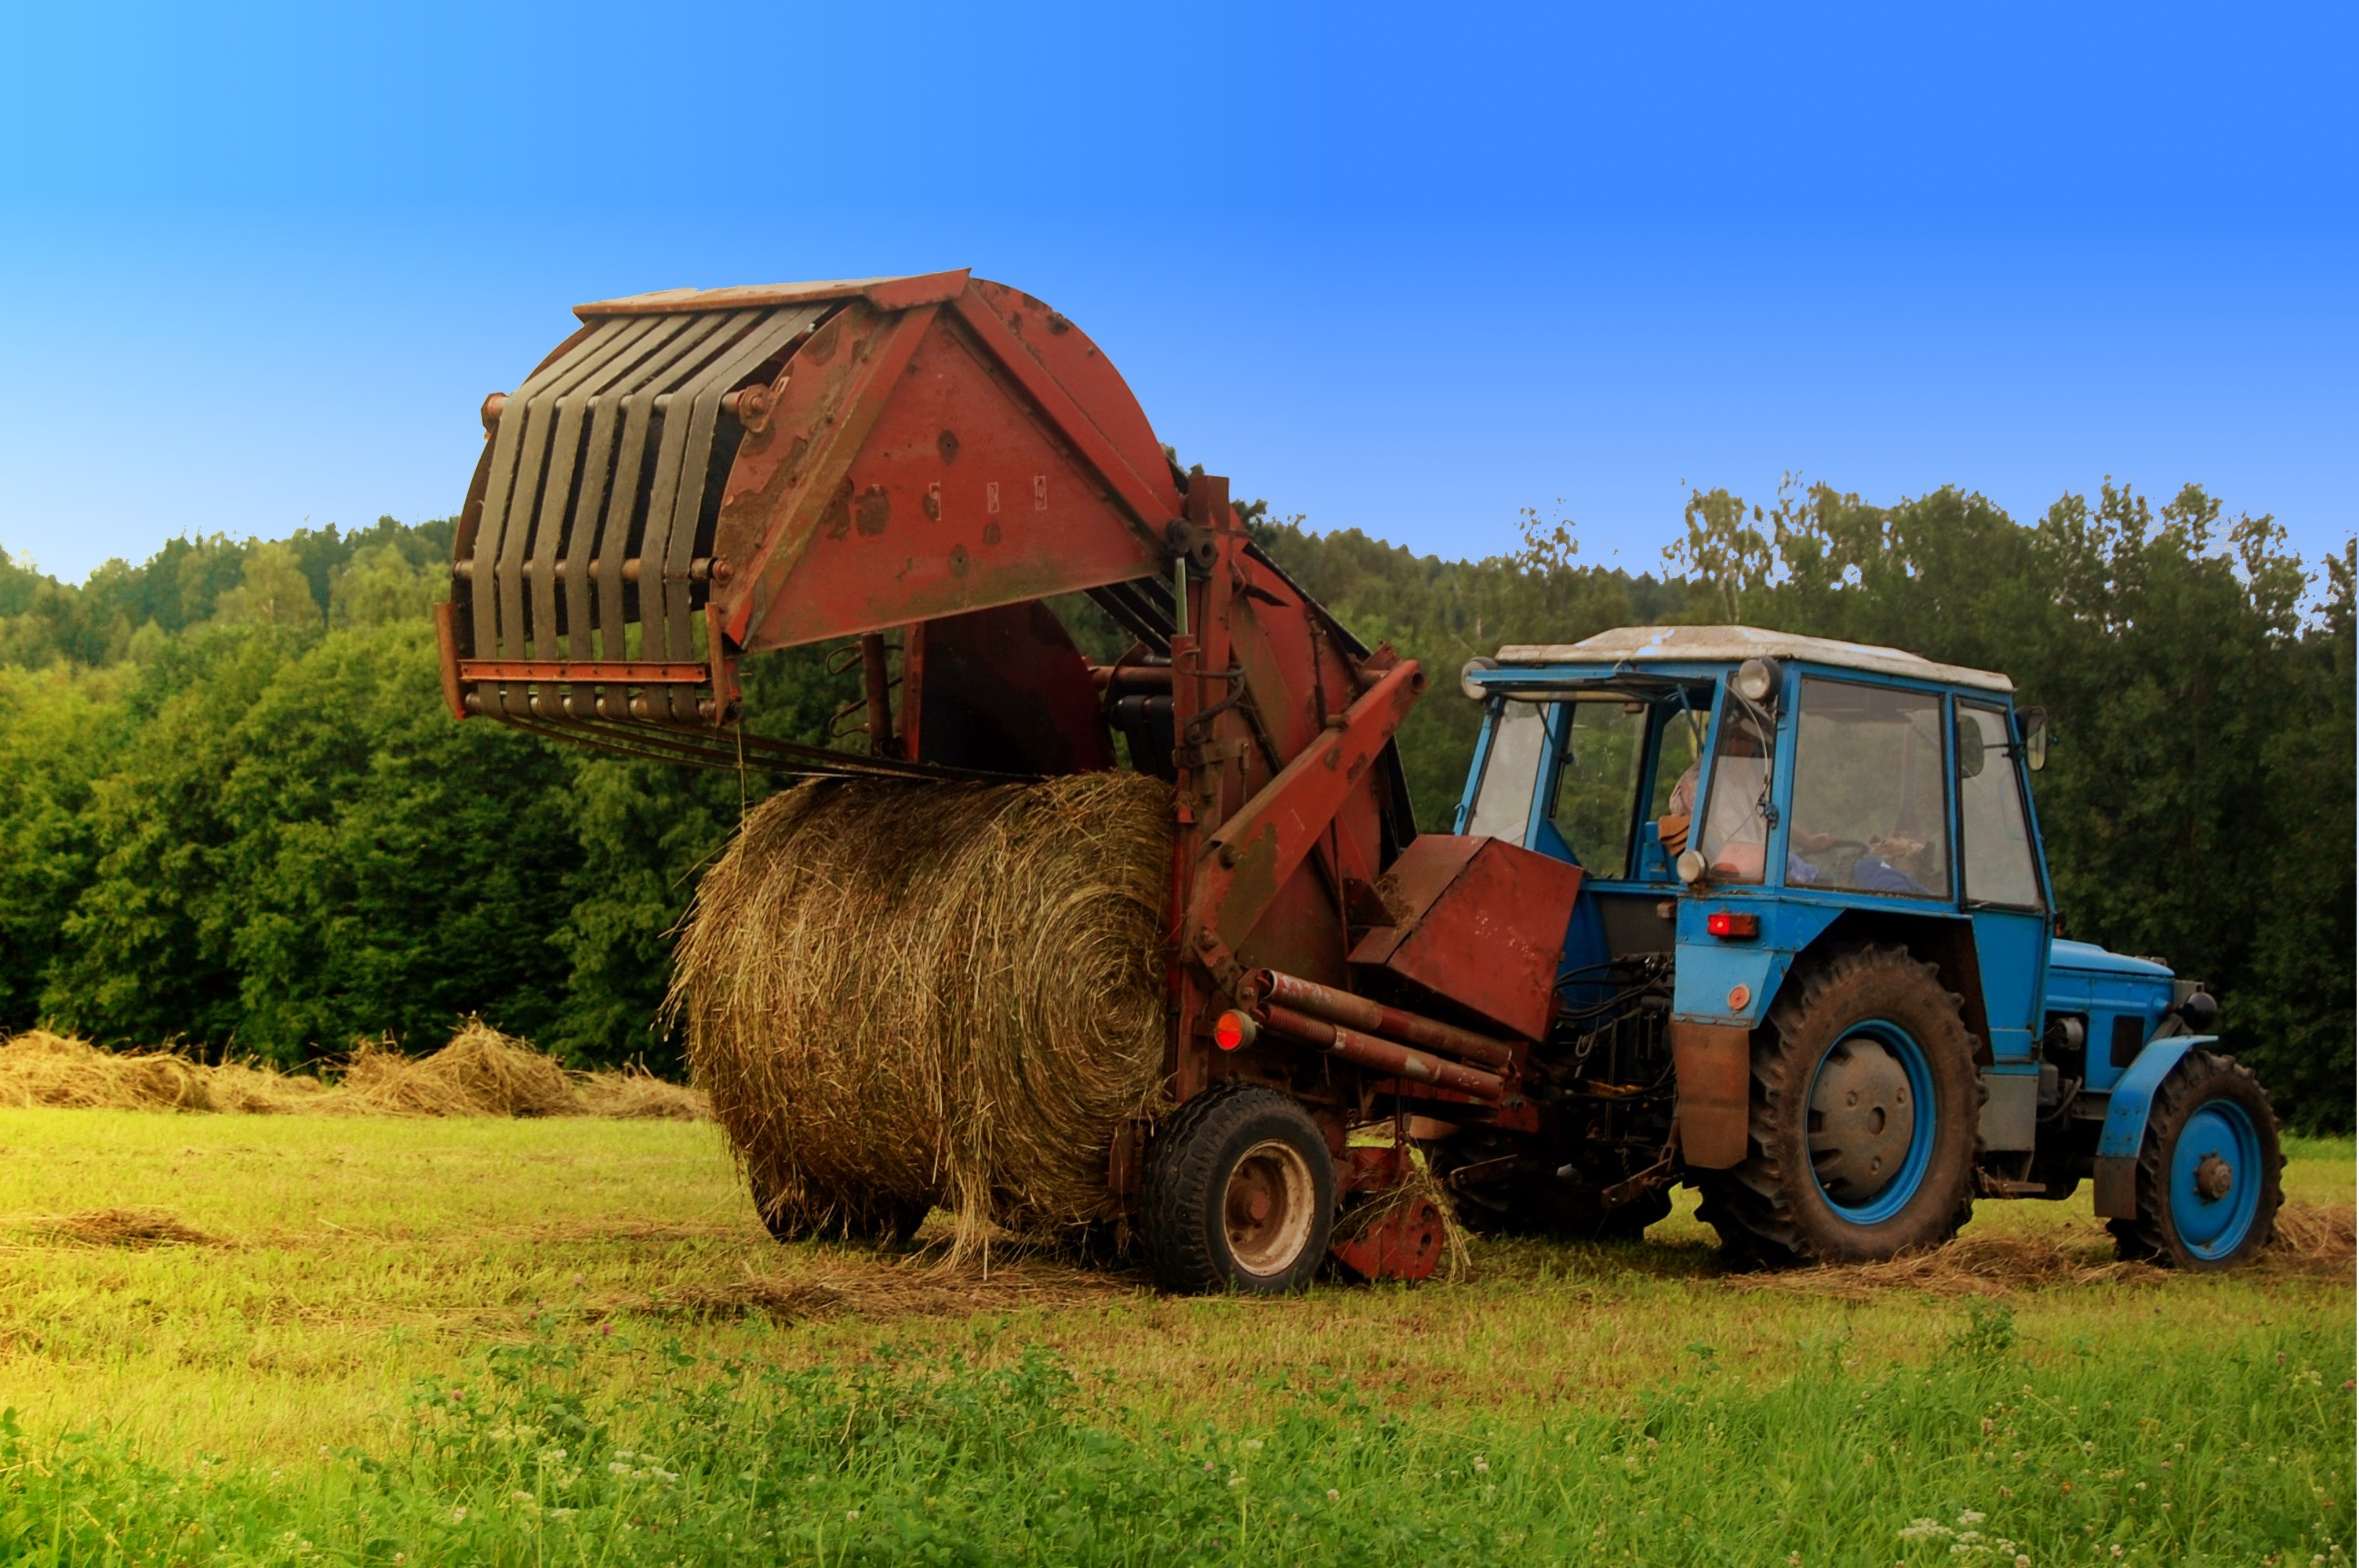 Traktor na wsi - fototapeta PIXERS